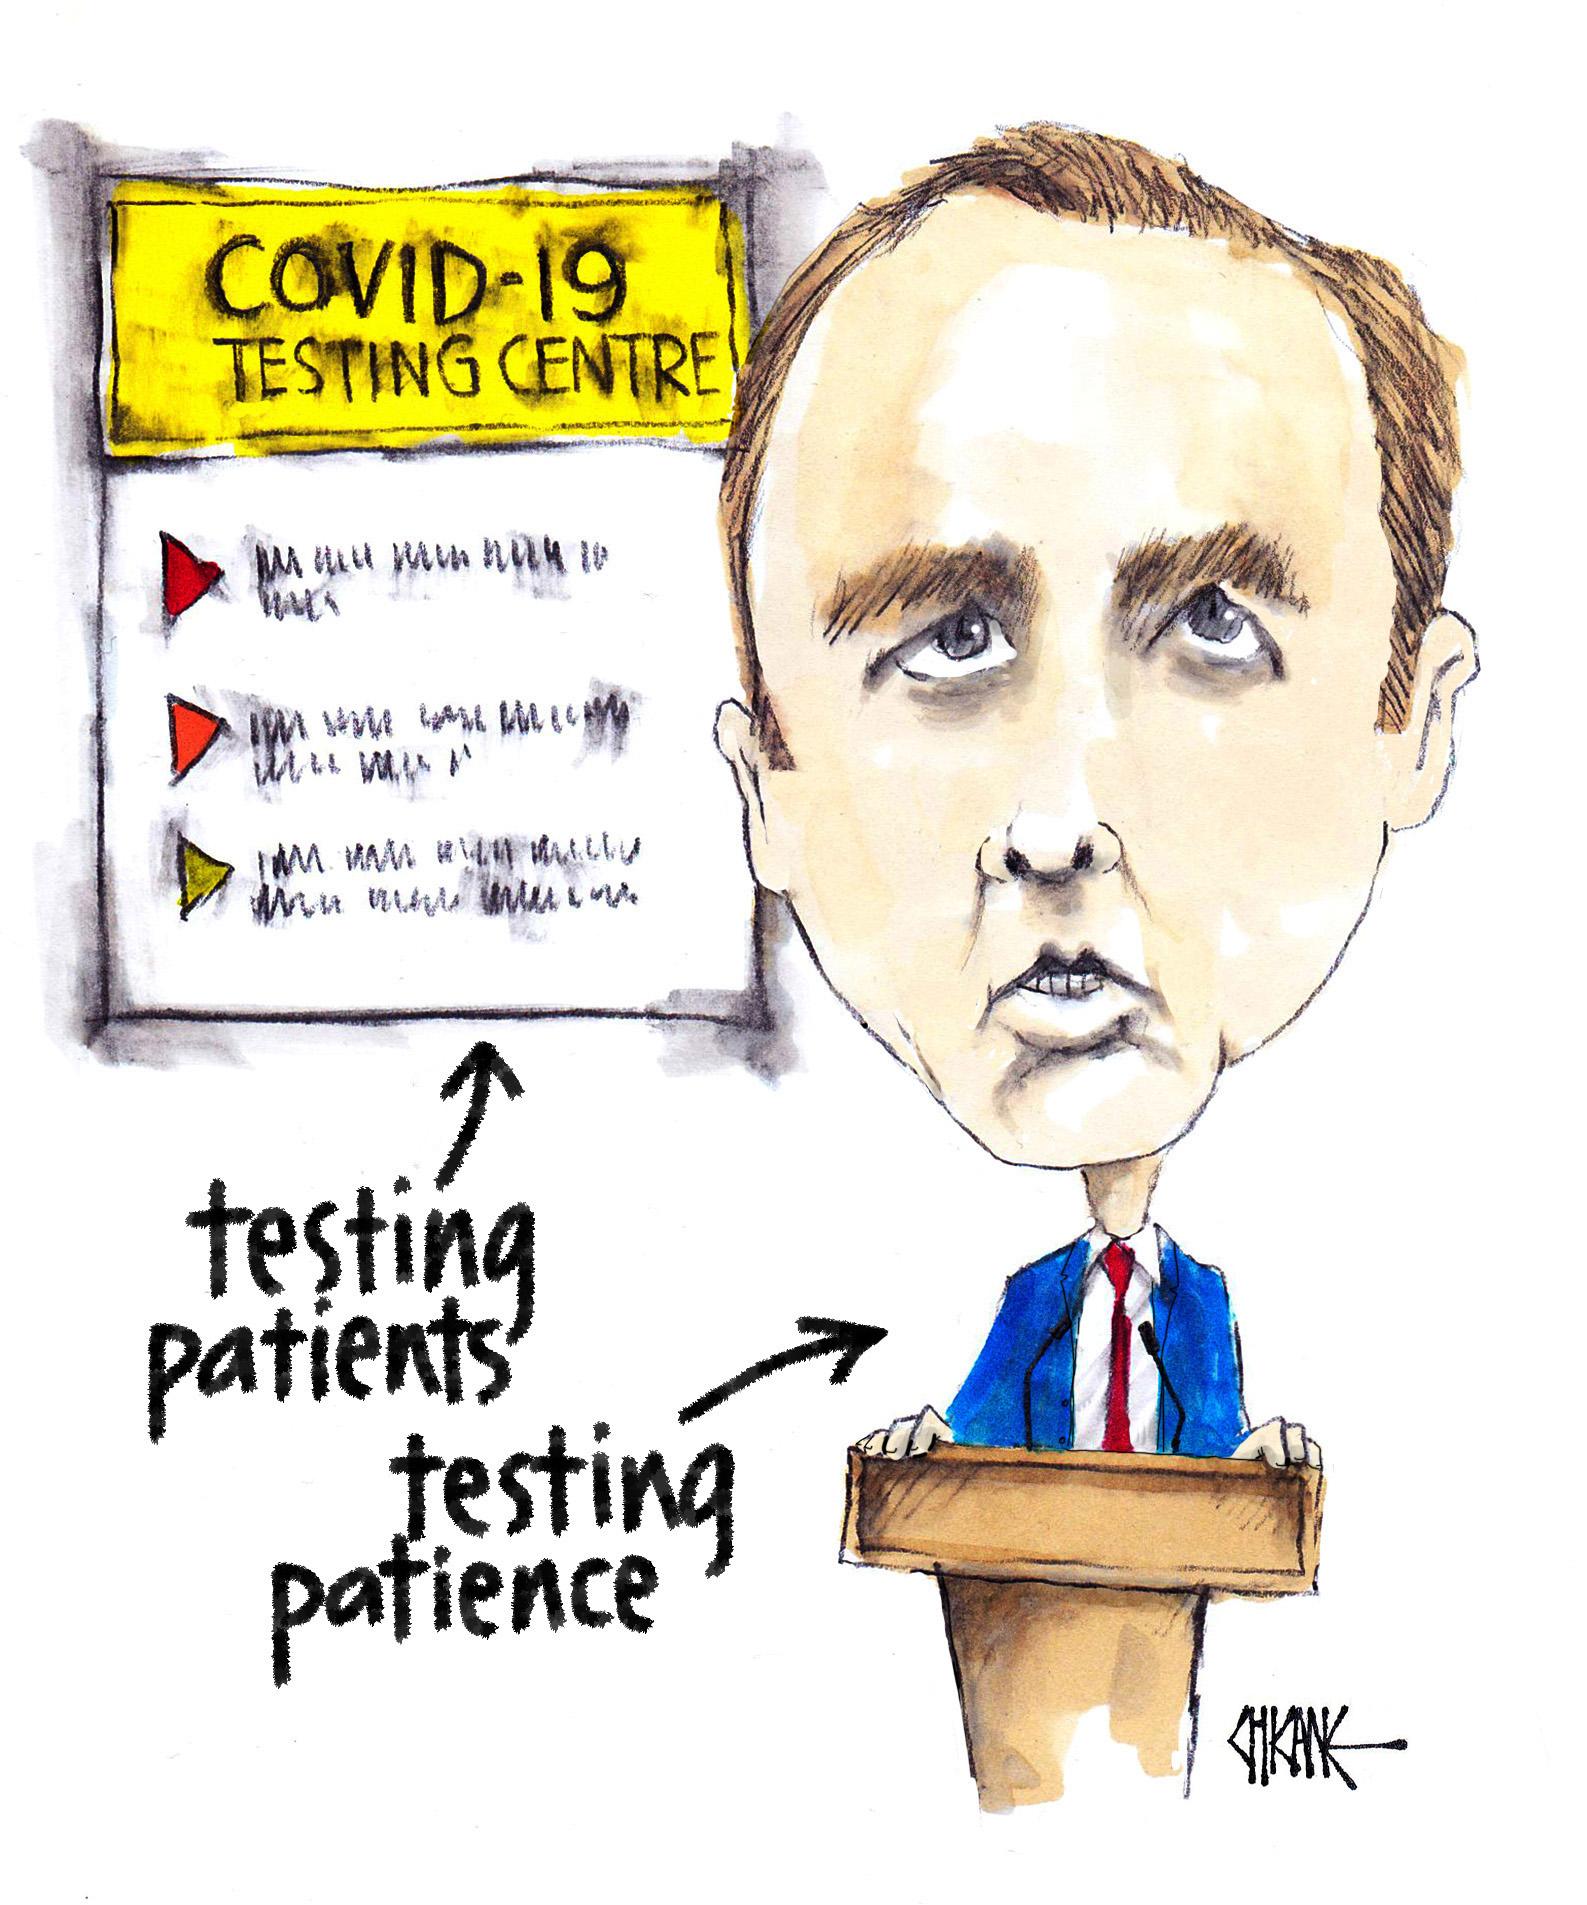 Matt Hancock testing patients and patience cartoon by Chicane